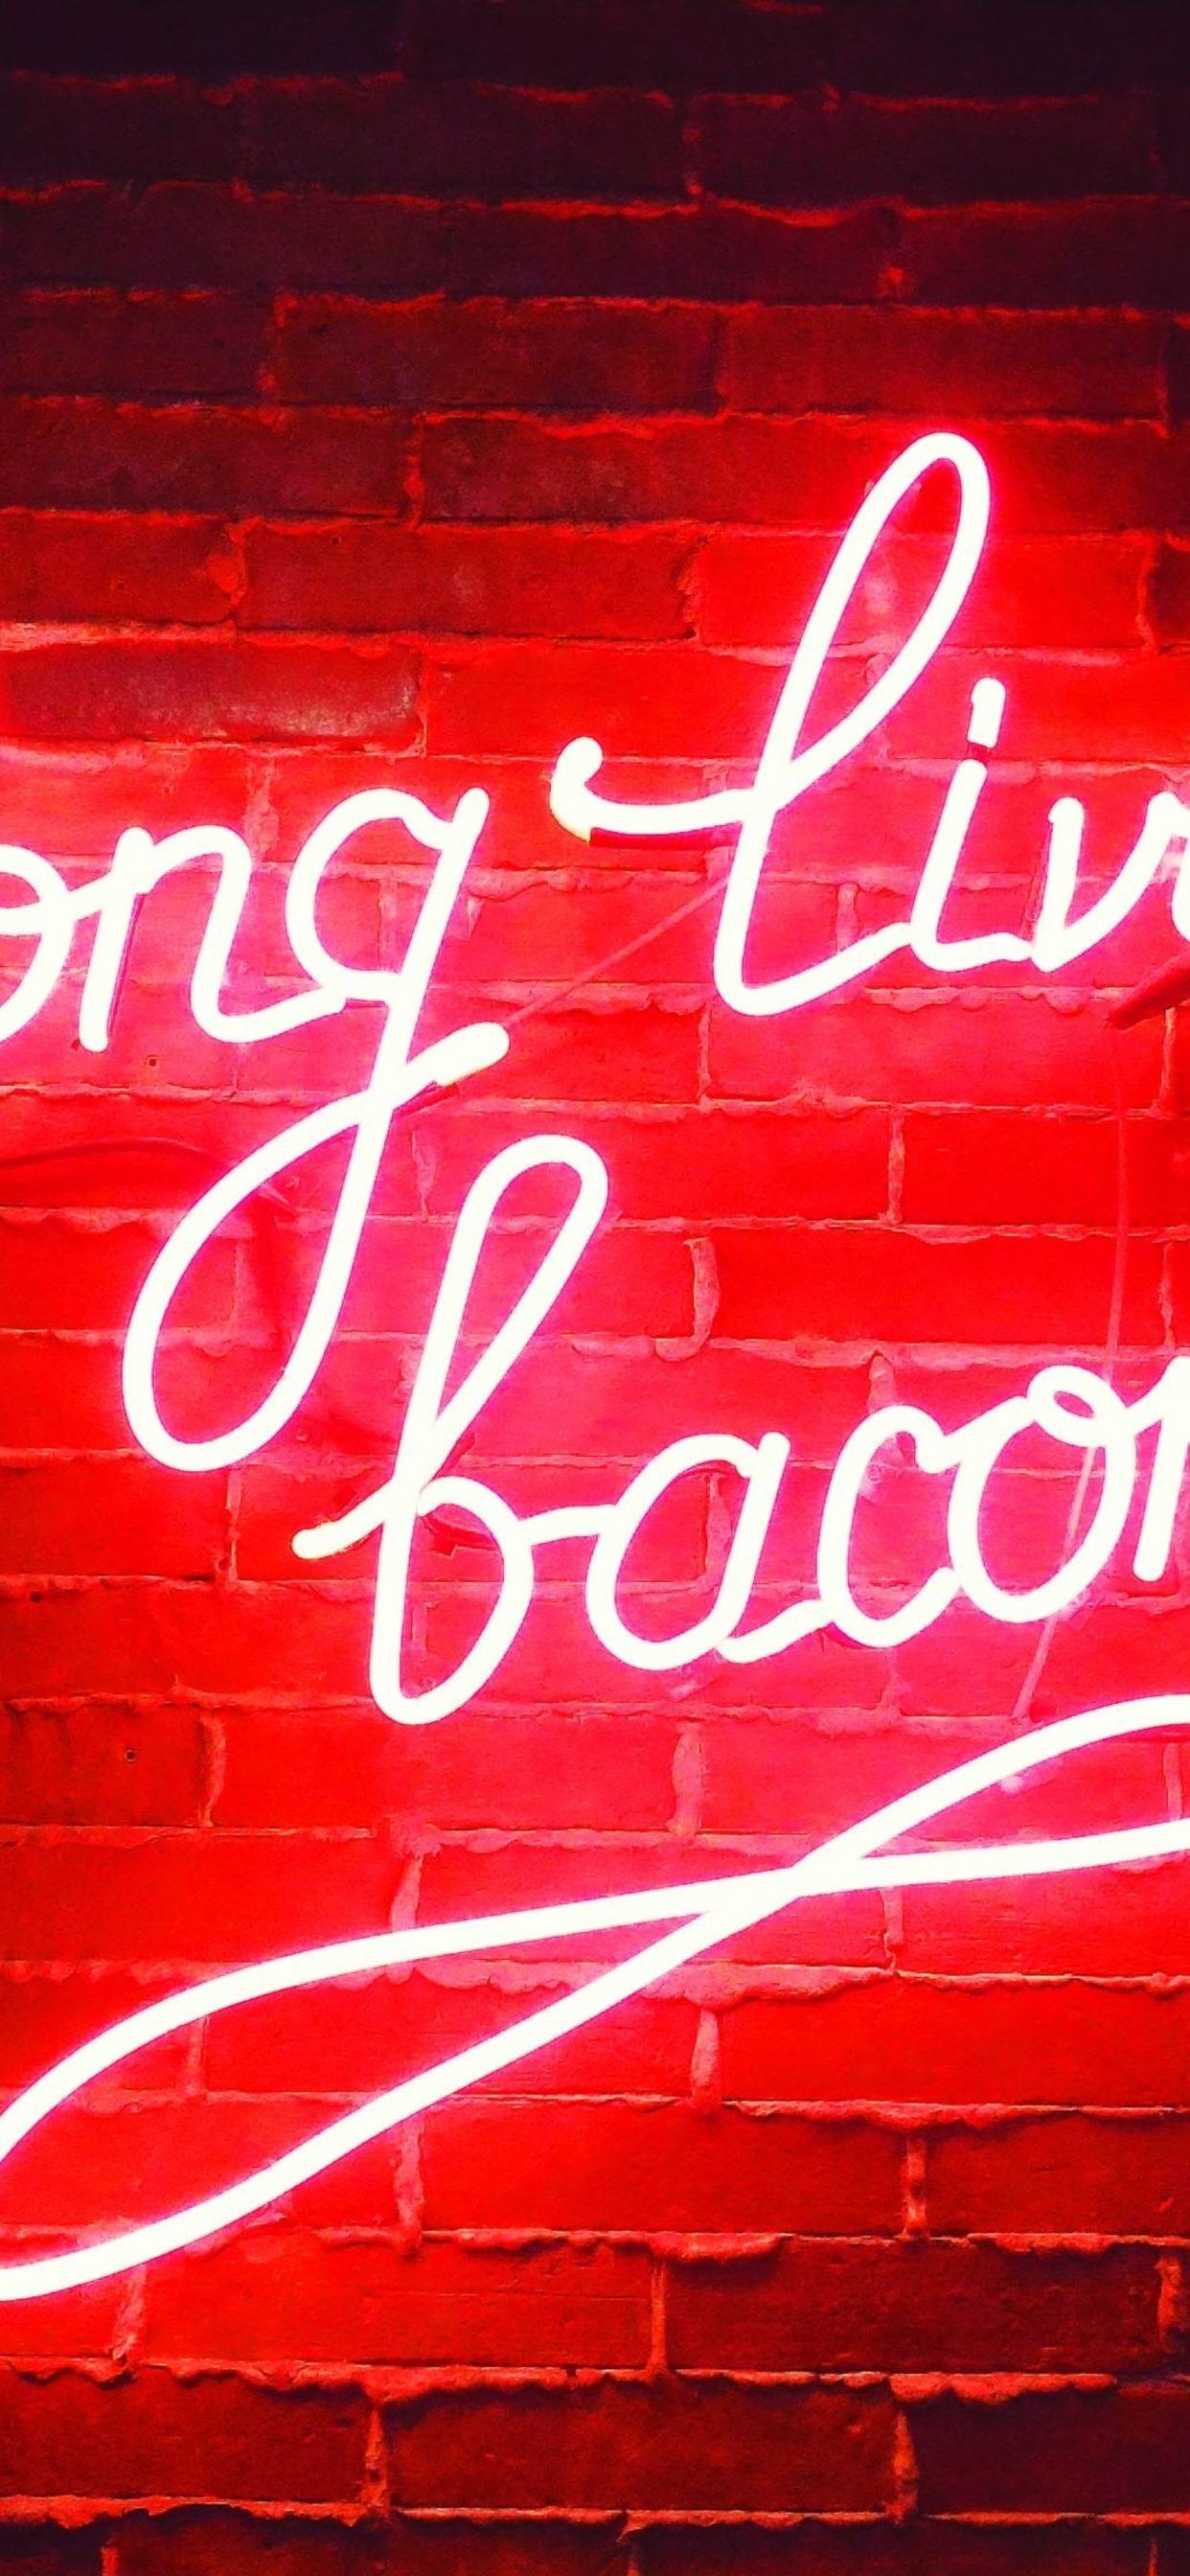 Long Live Bacon Neon Lights S9   Data Src Neon Lights - Neon Live Wallpaper 4k Iphone - HD Wallpaper